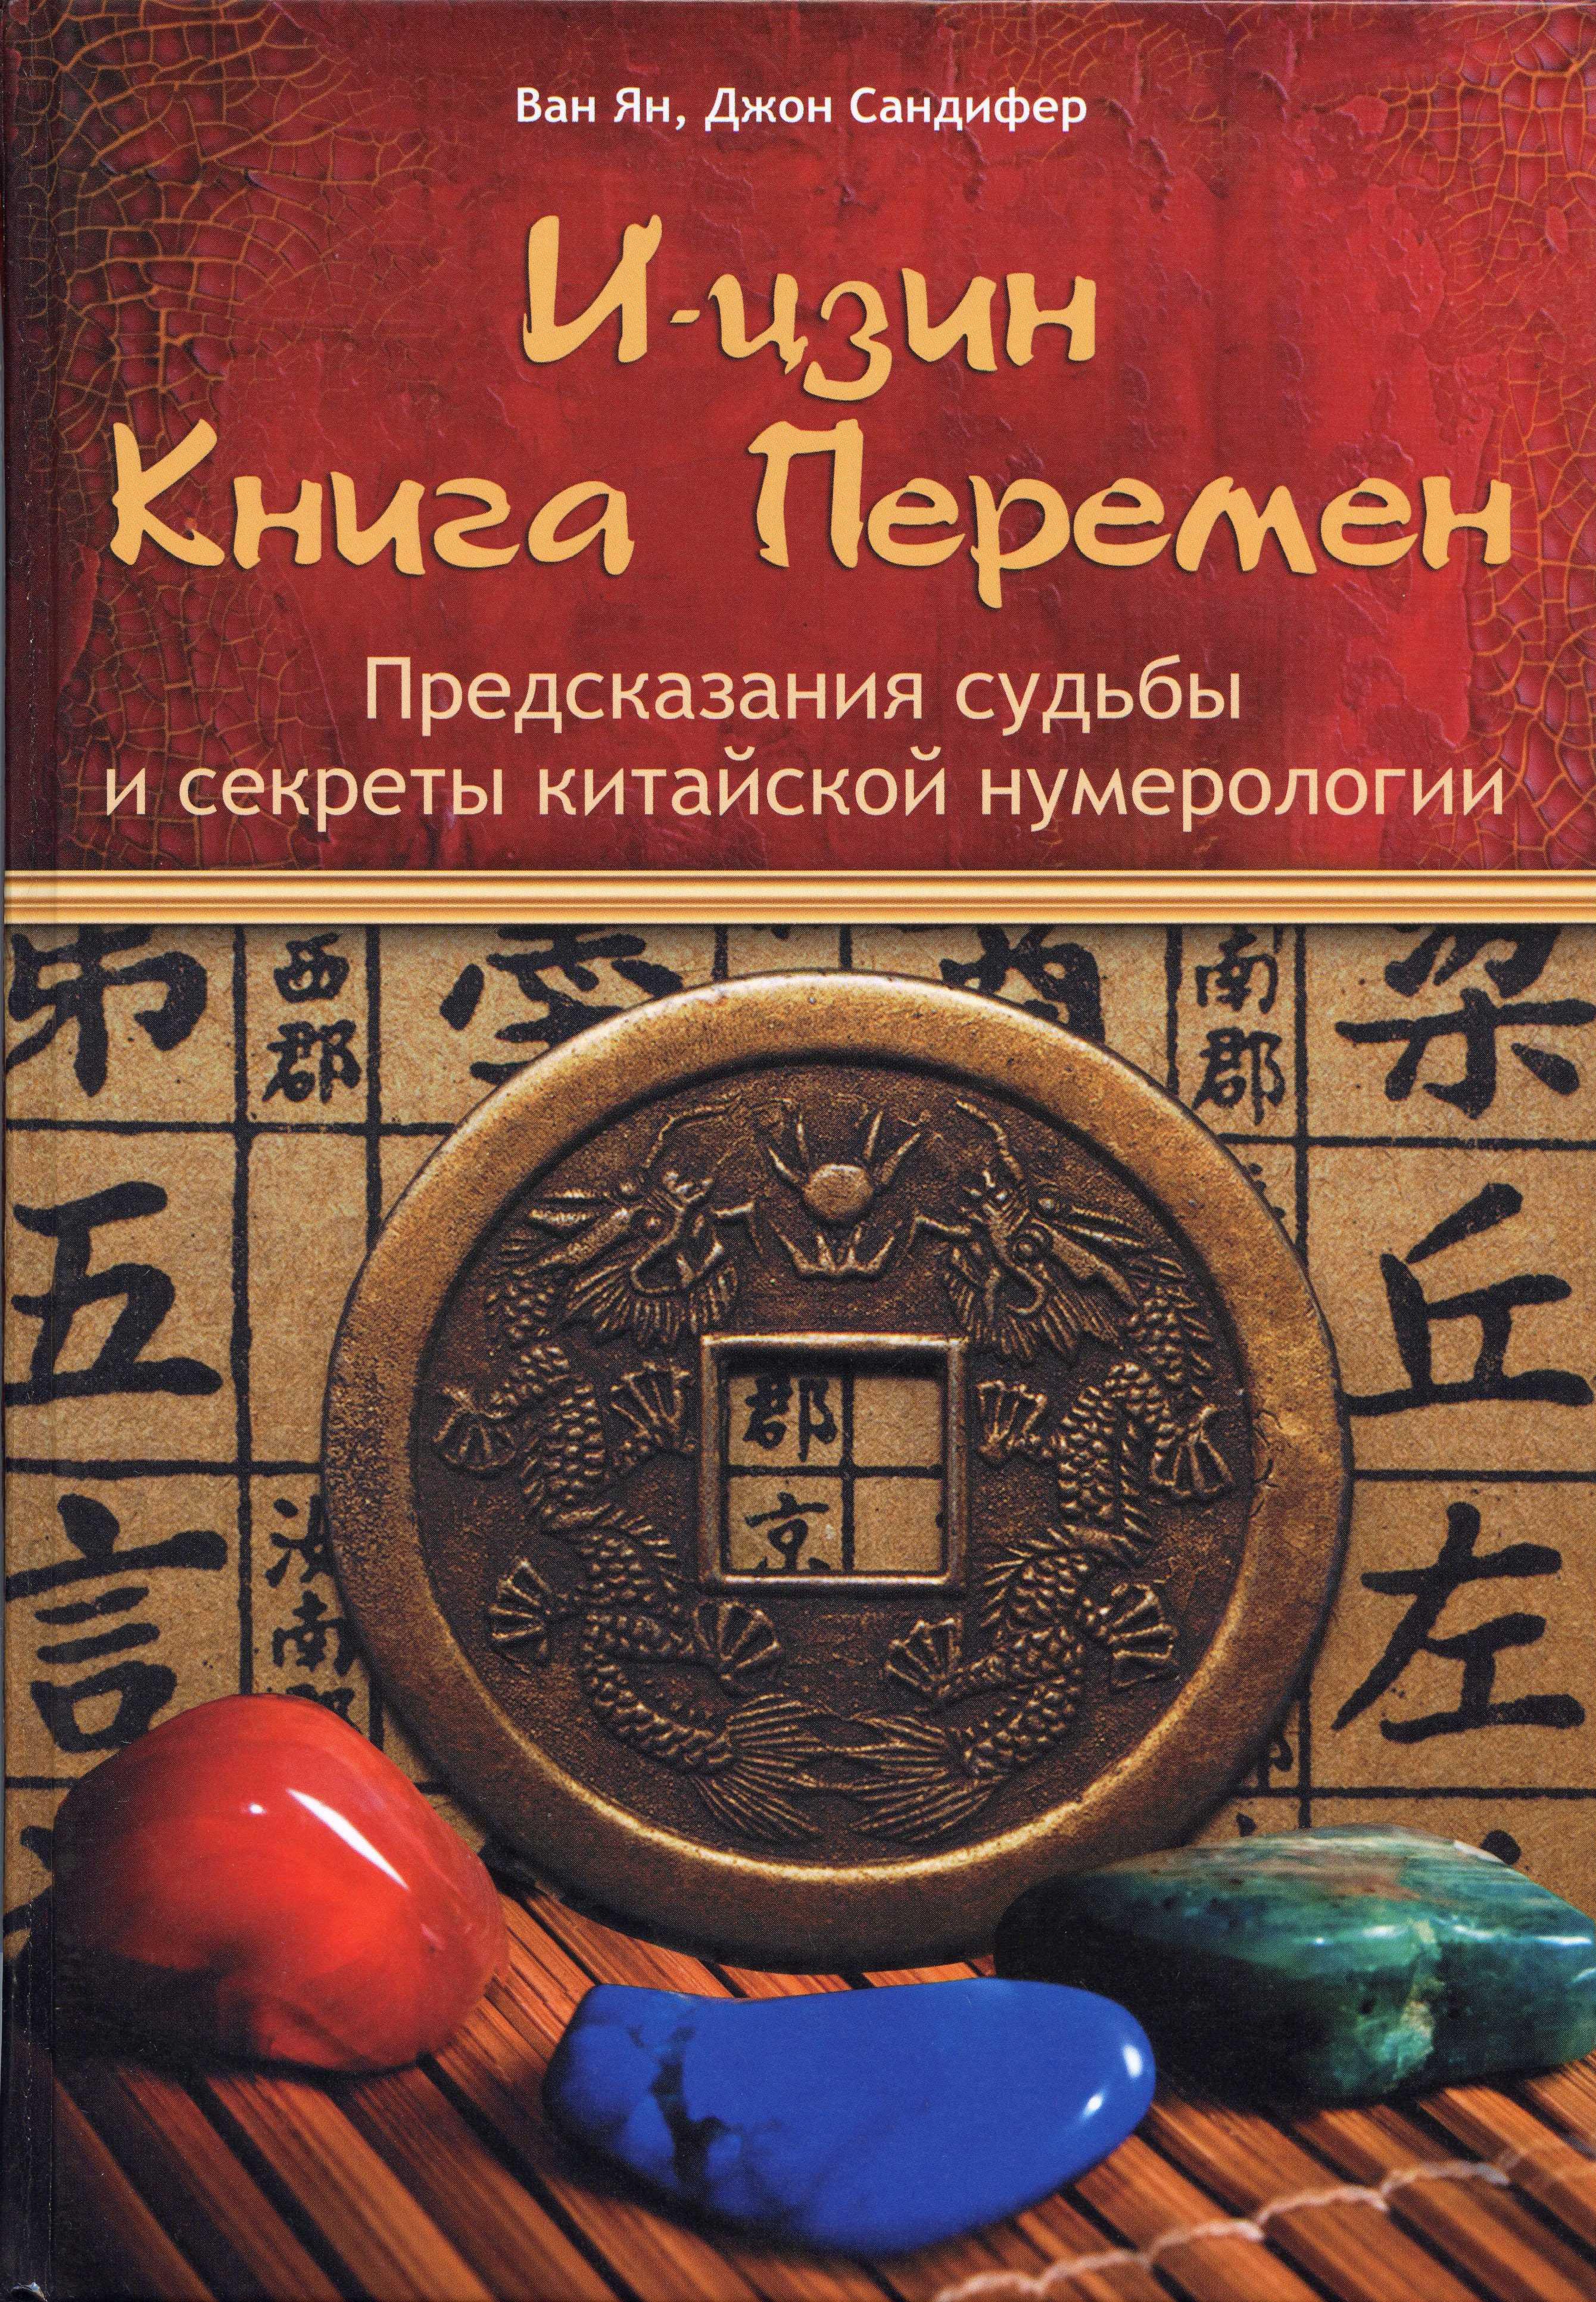 Толкование Книги Перемен Шуцкого